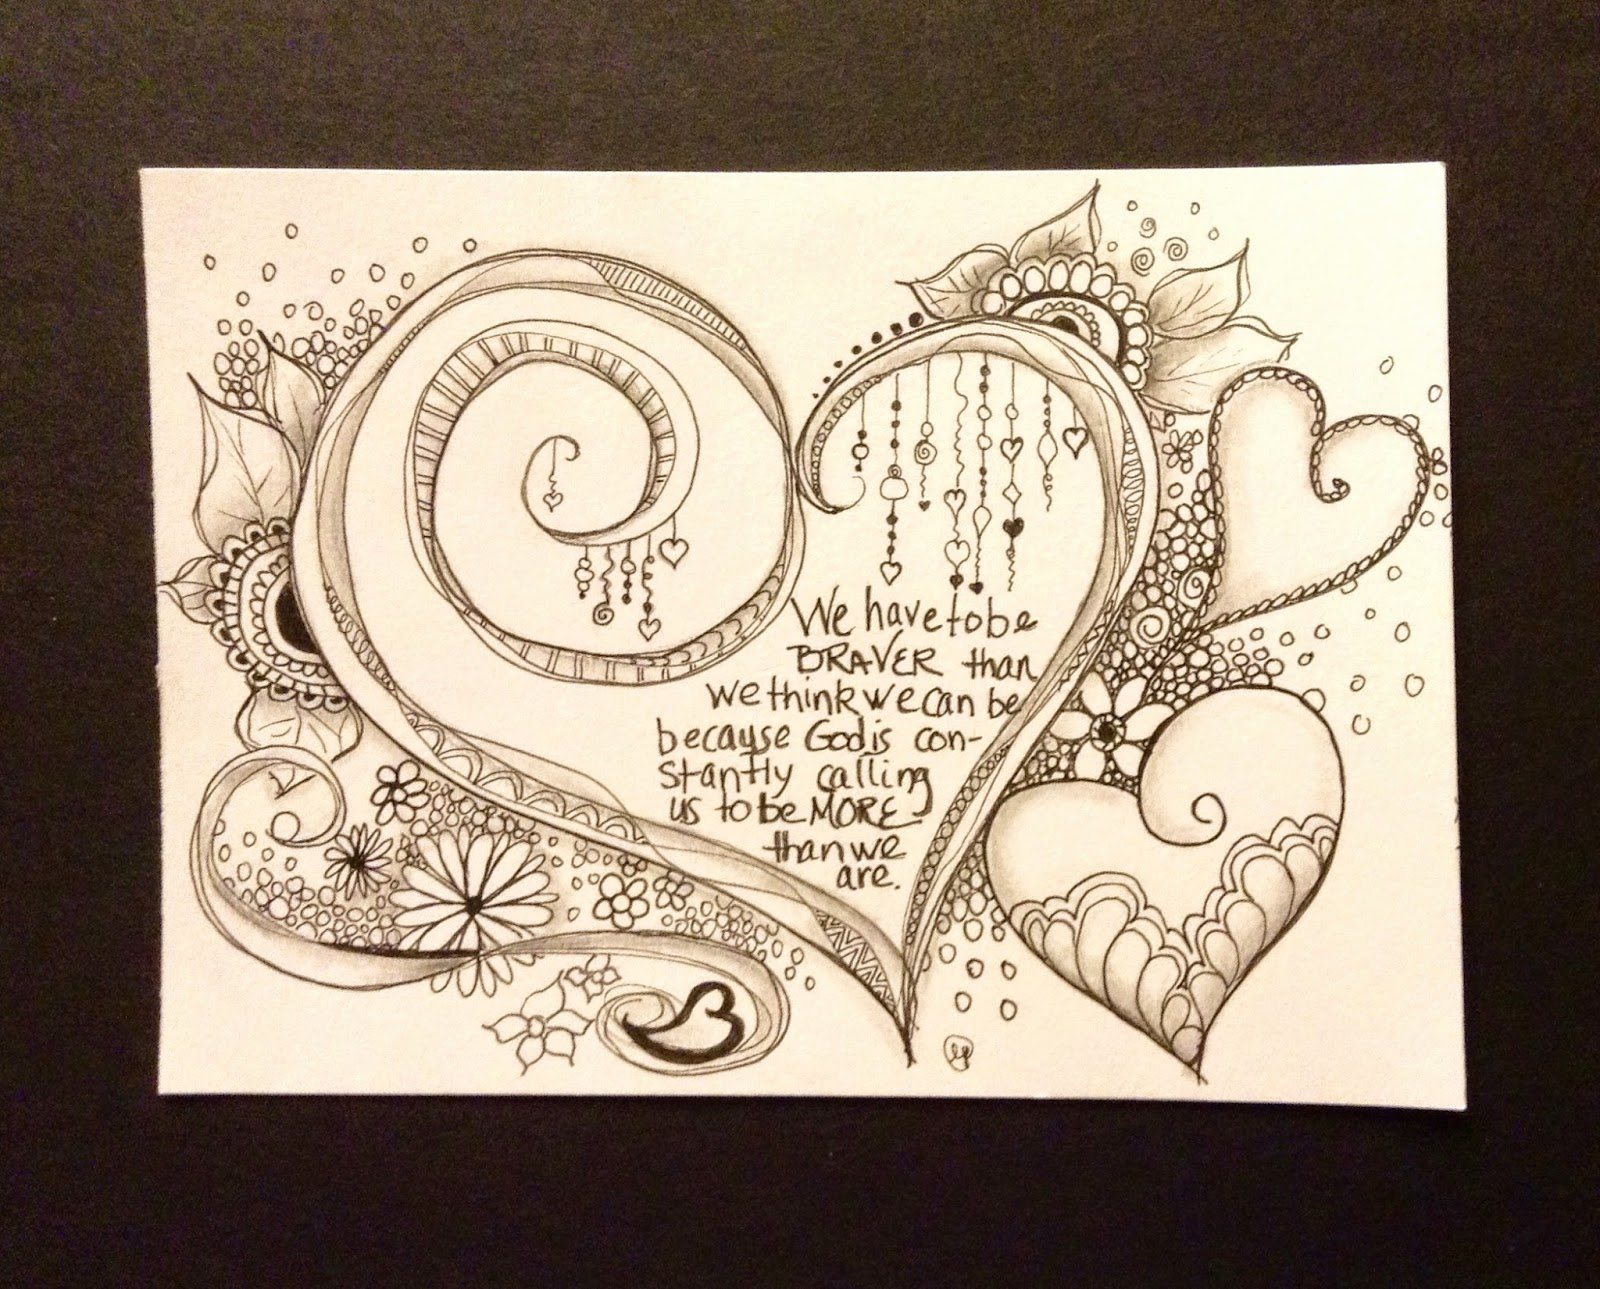 Hearts In Zentangle Style Stock Vector - Image: 65979218 |Zentangle Heart Graphics